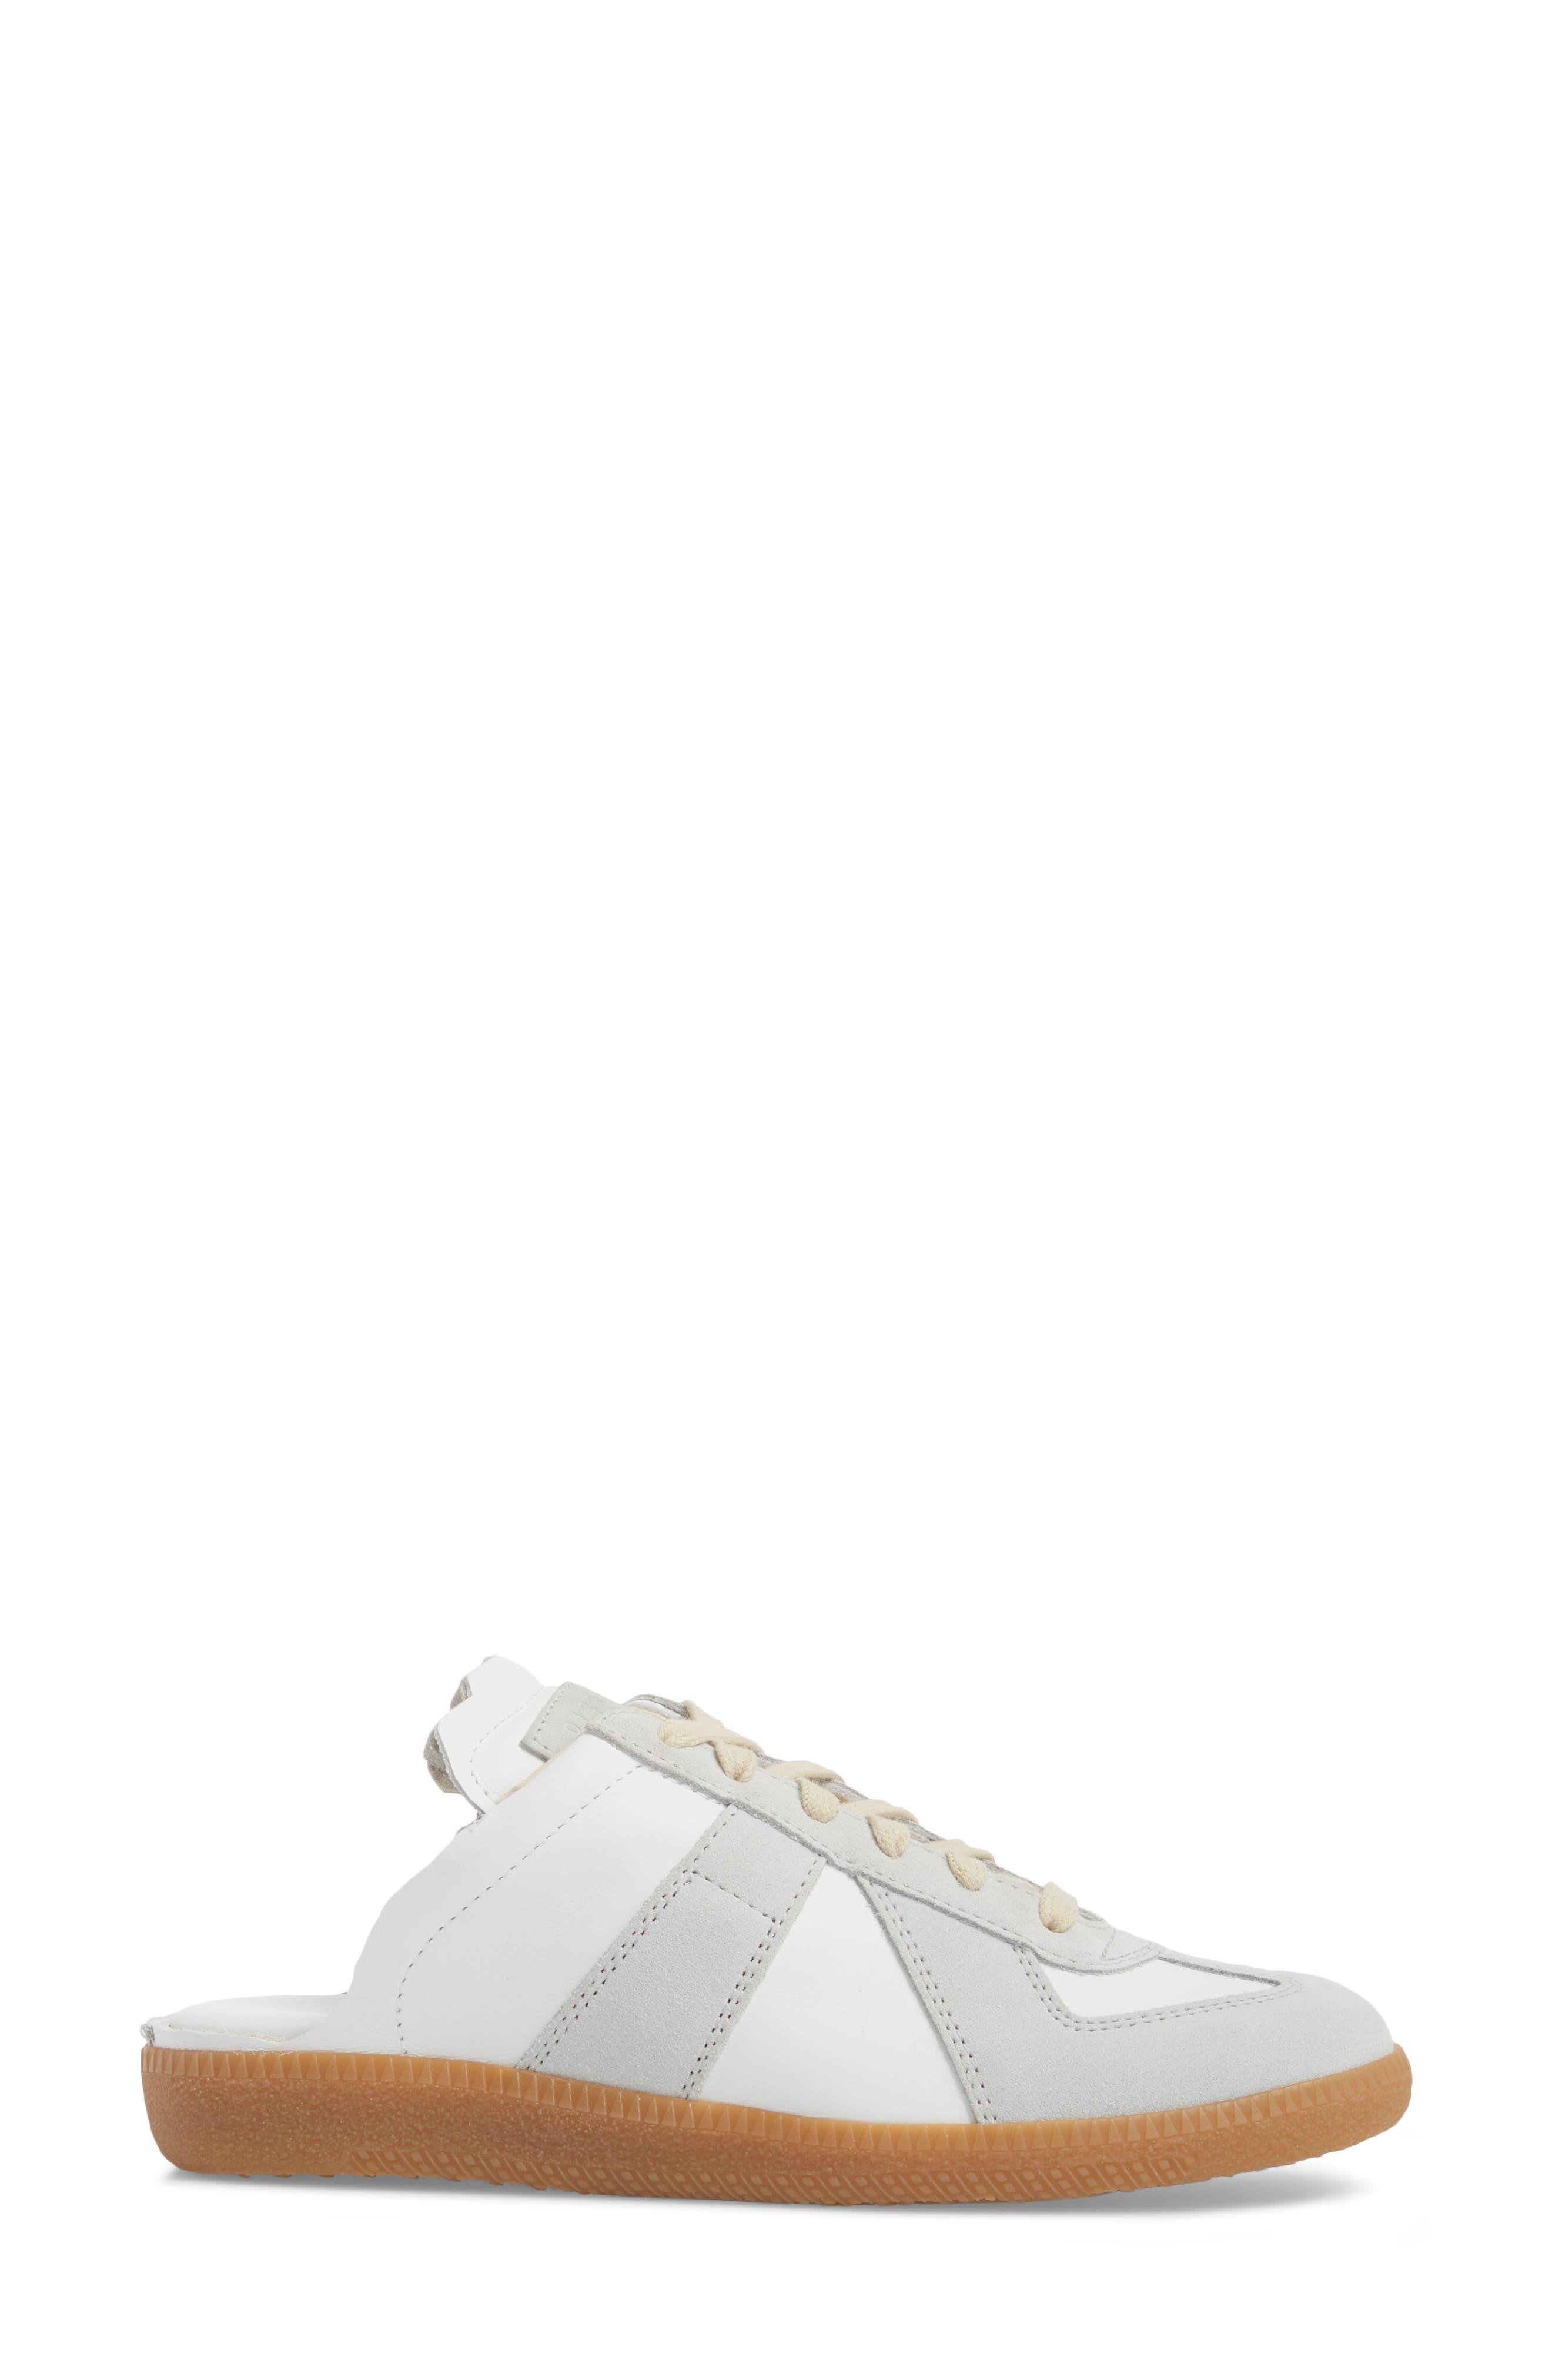 Replica Sneaker Mule,                             Alternate thumbnail 3, color,                             Amber/ White